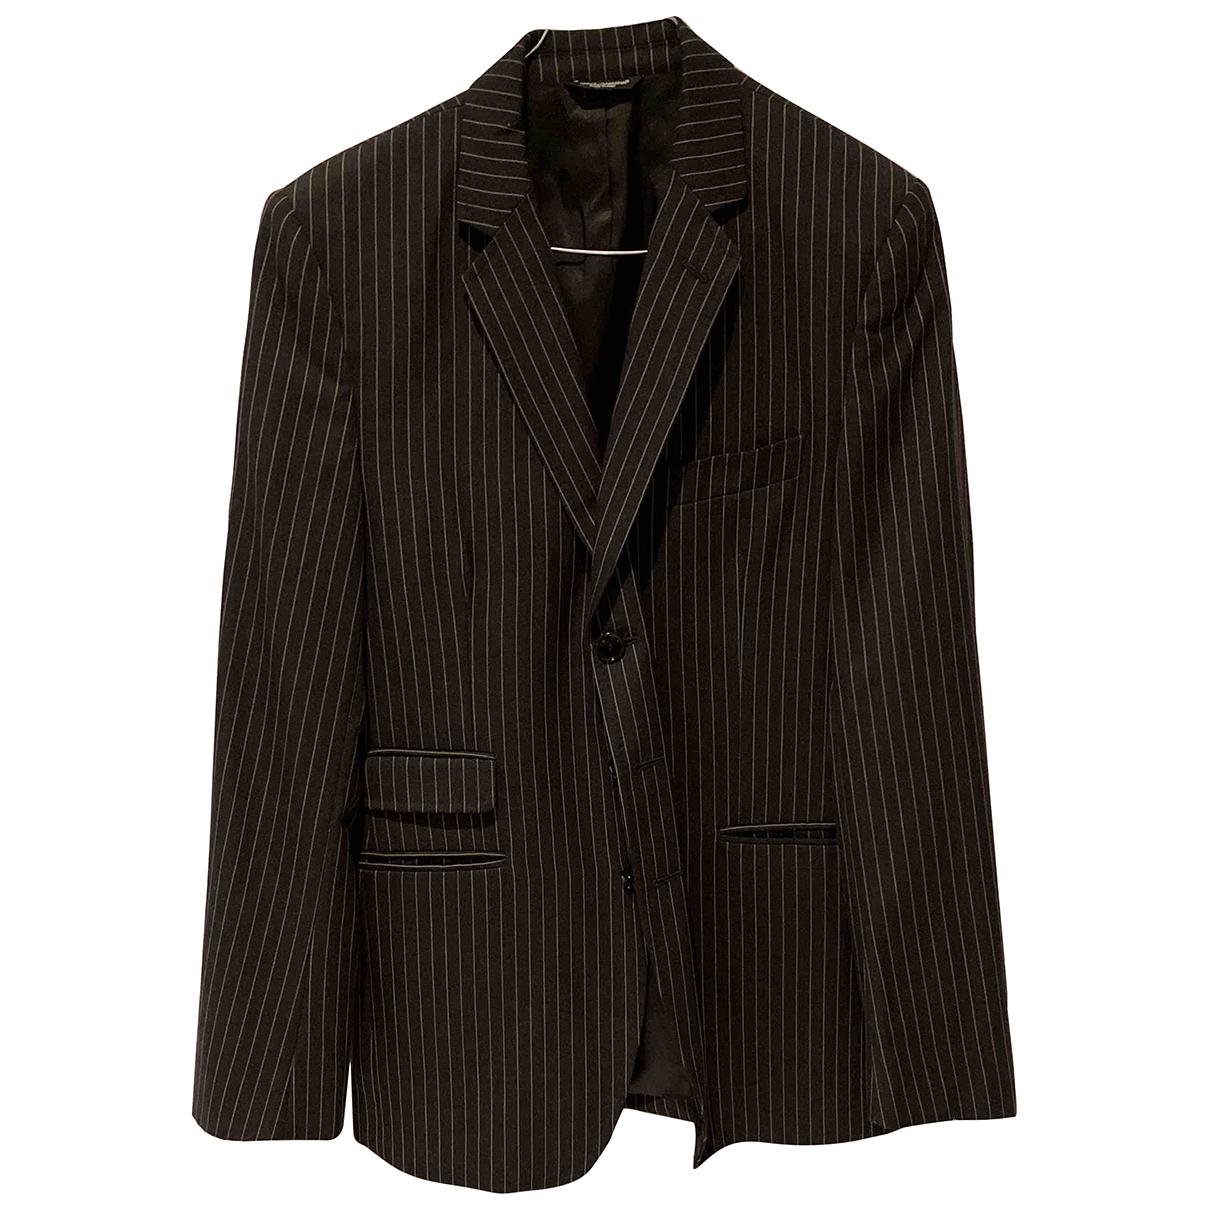 Dolce & Gabbana N Black Suits for Men 48 IT